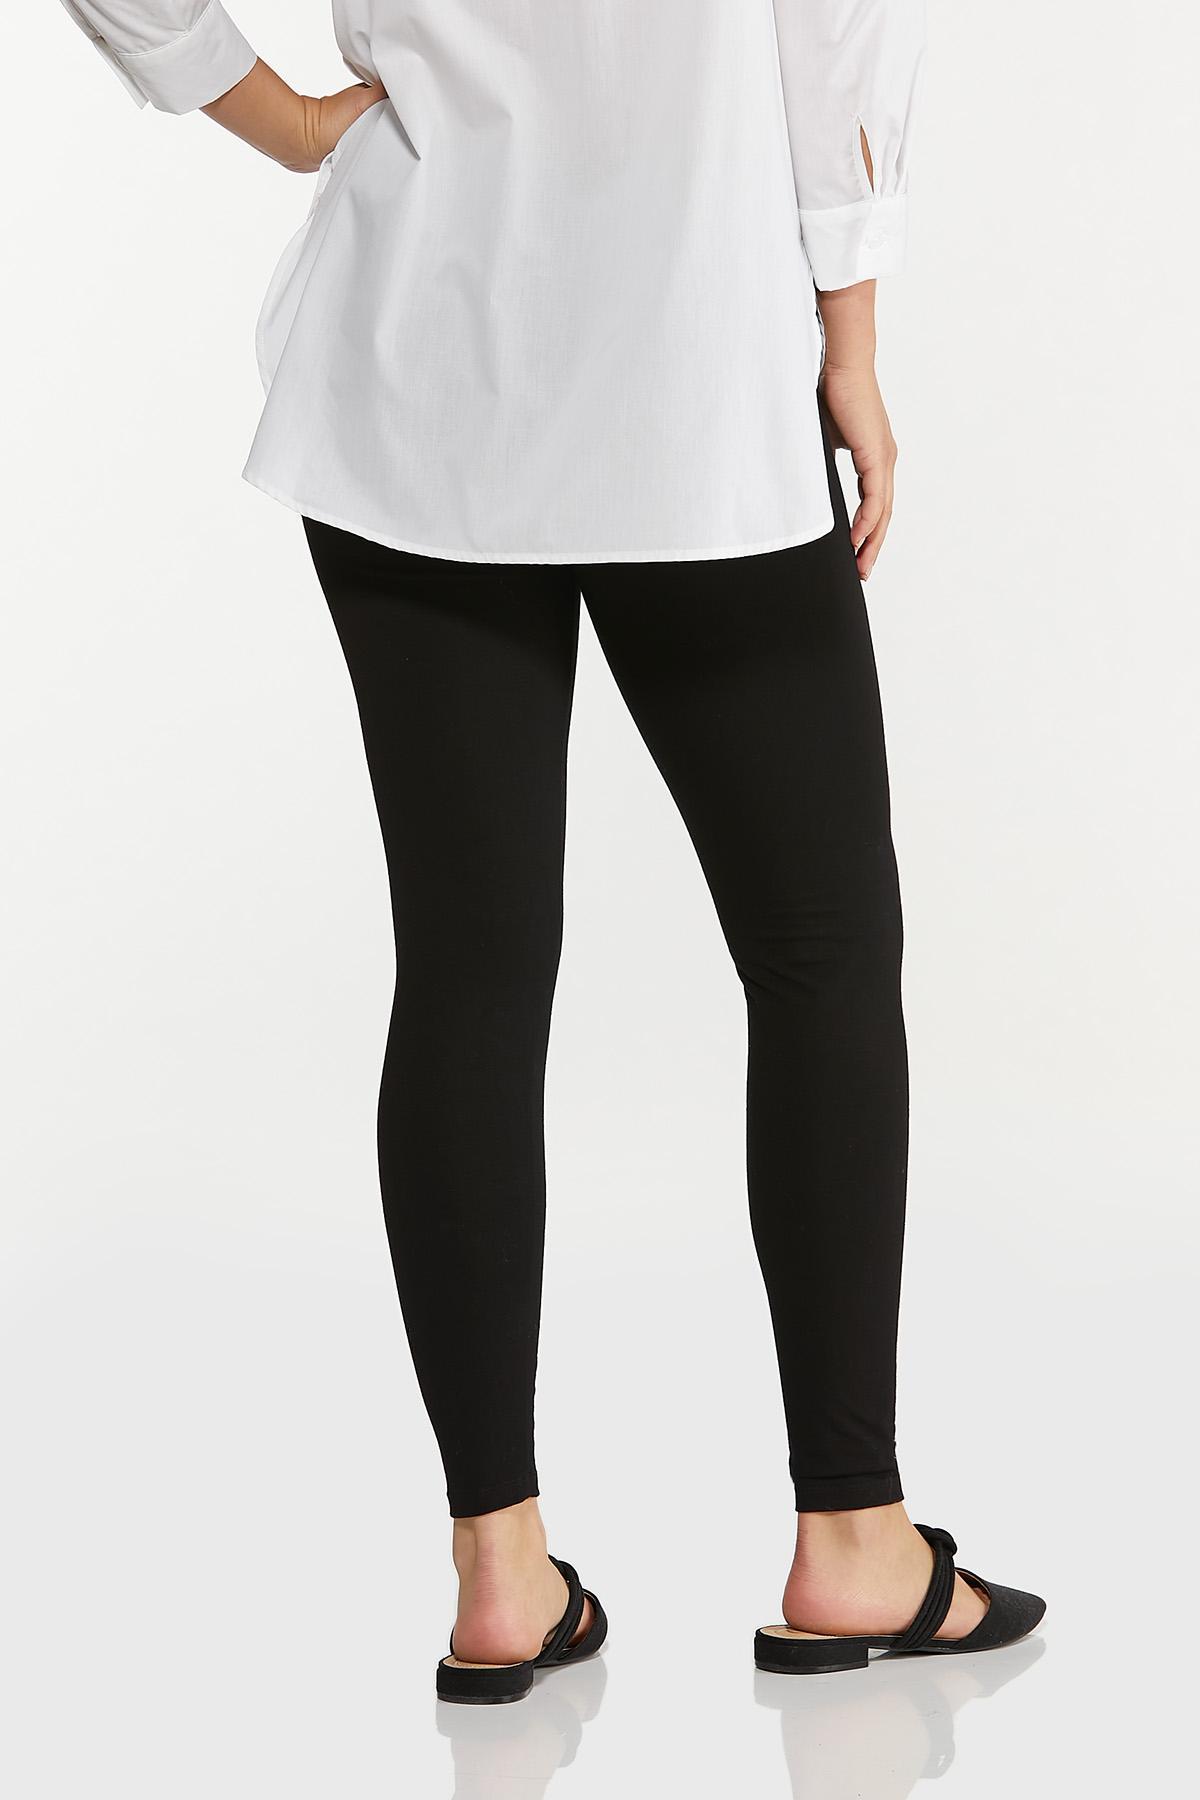 Solid Leggings (Item #44650971)